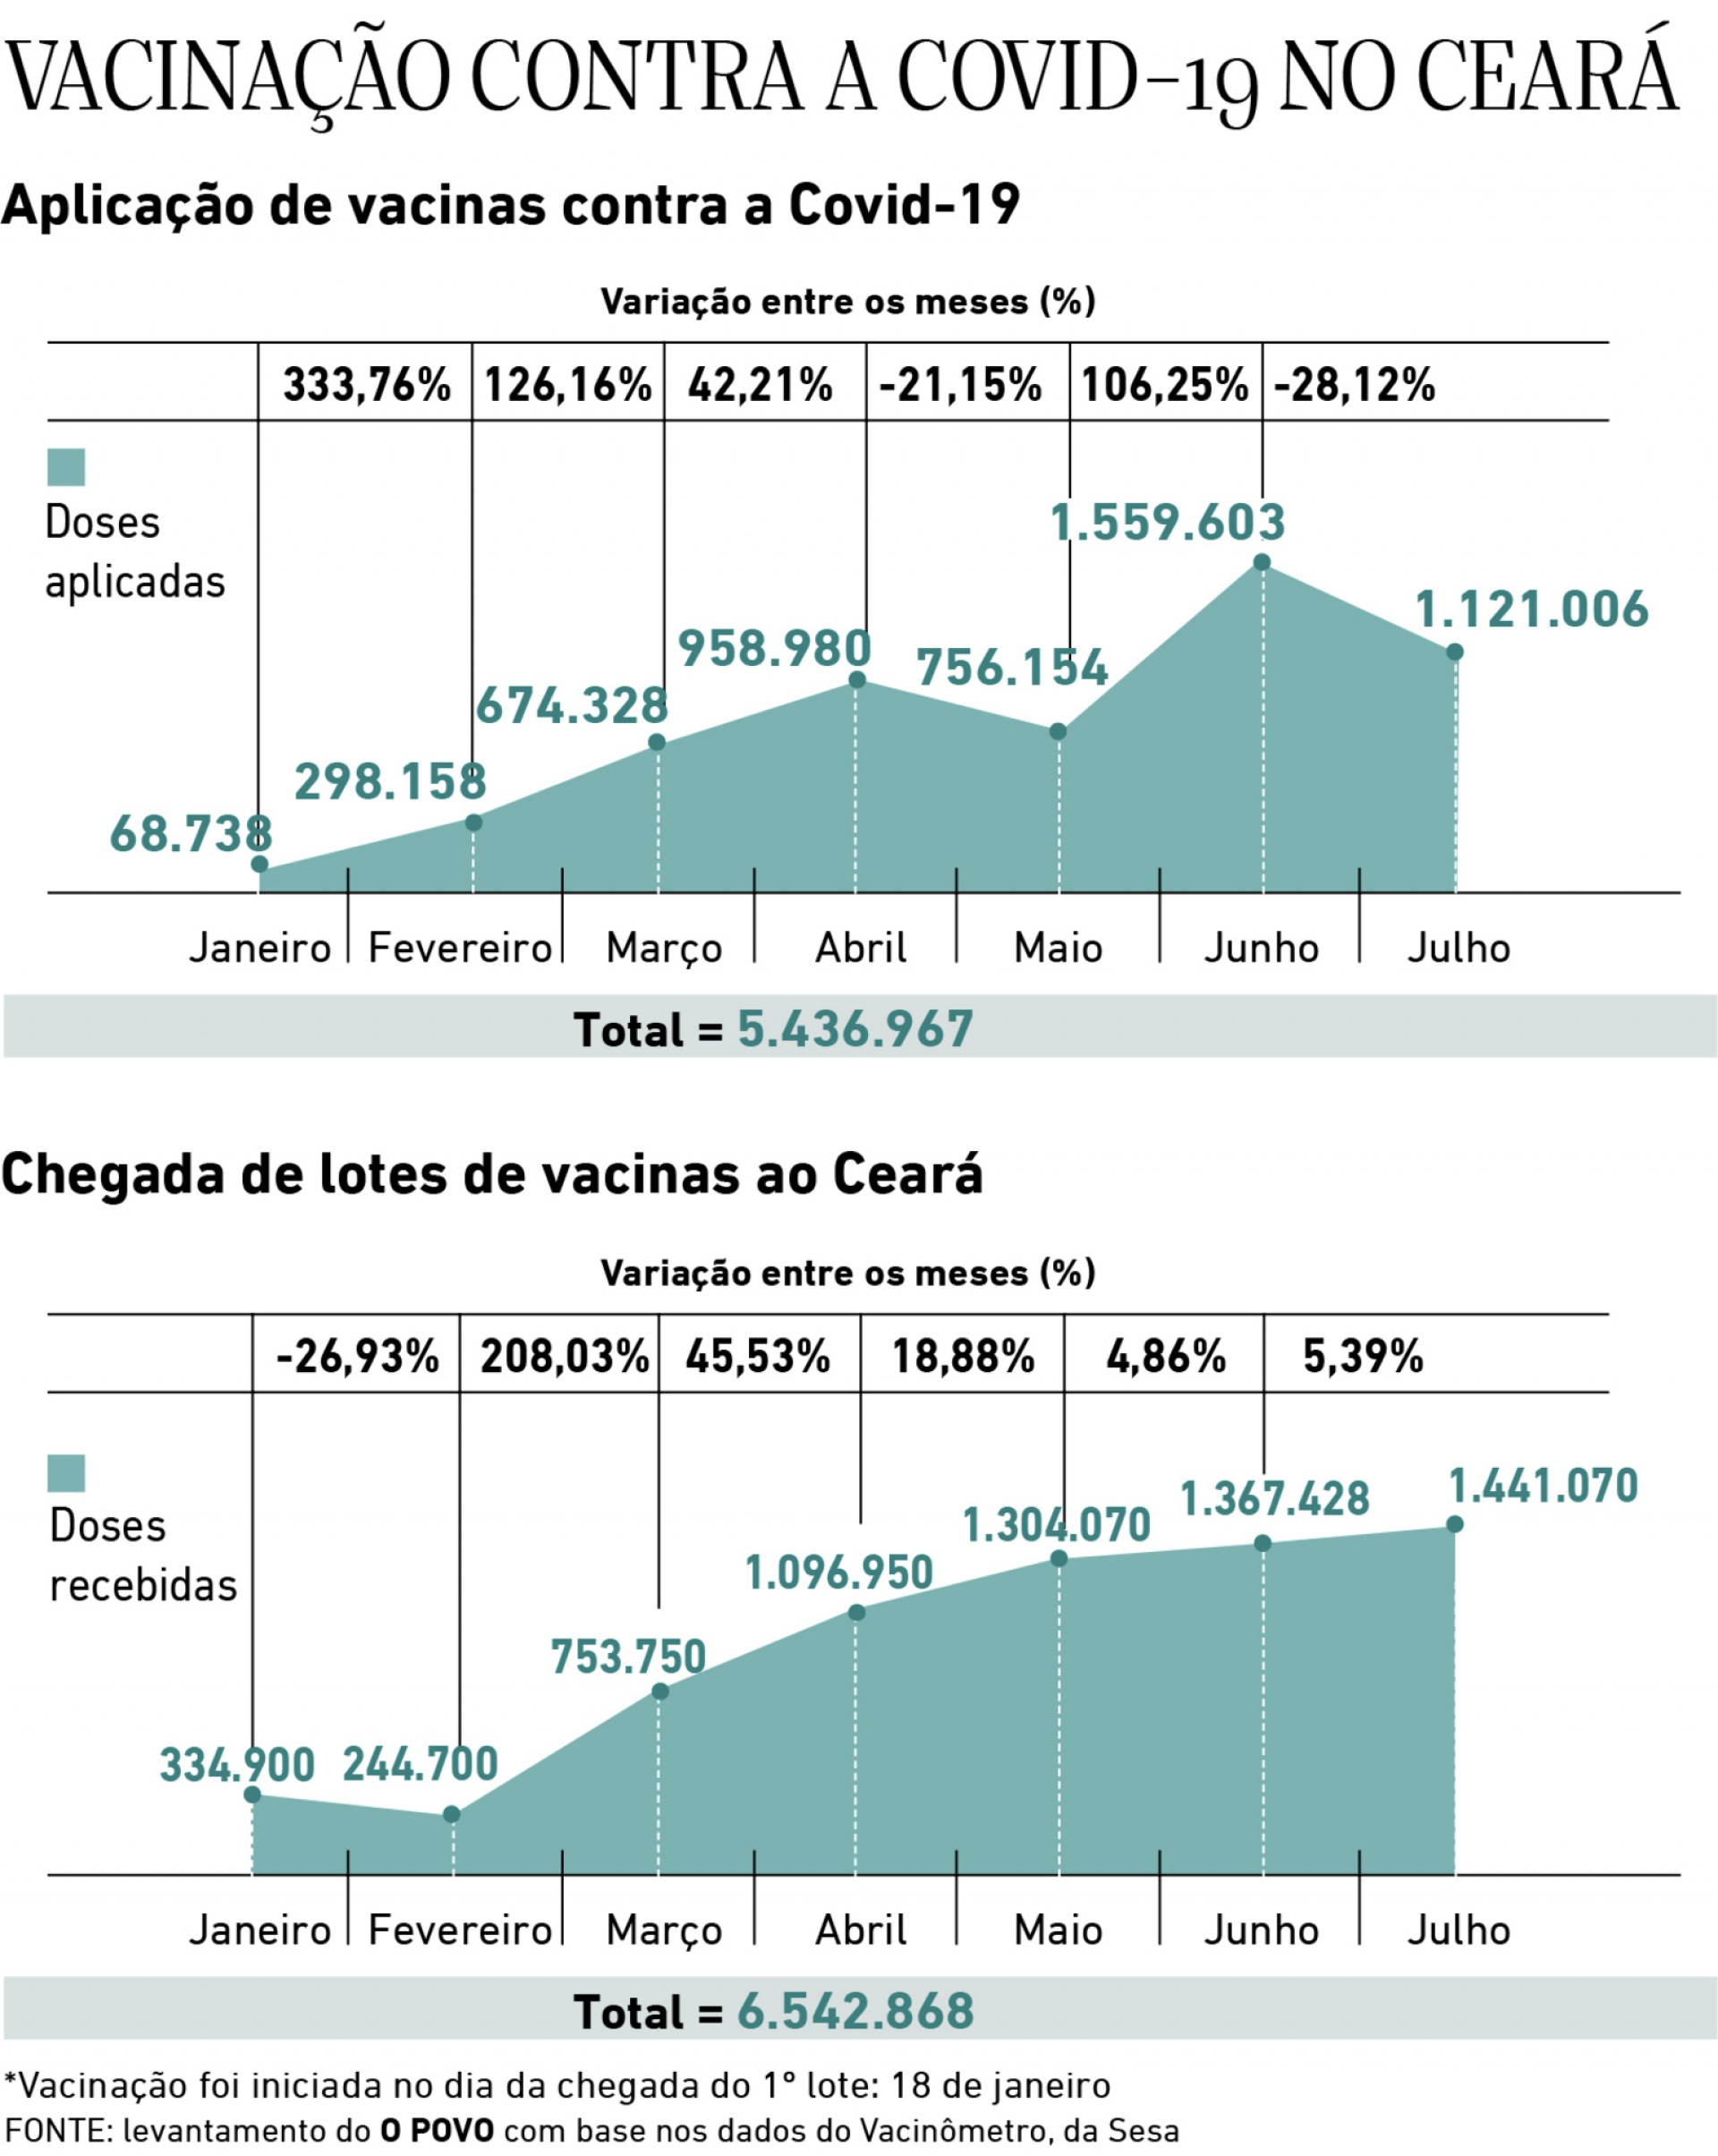 Doses aplicadas e doses recebidas no Ceará